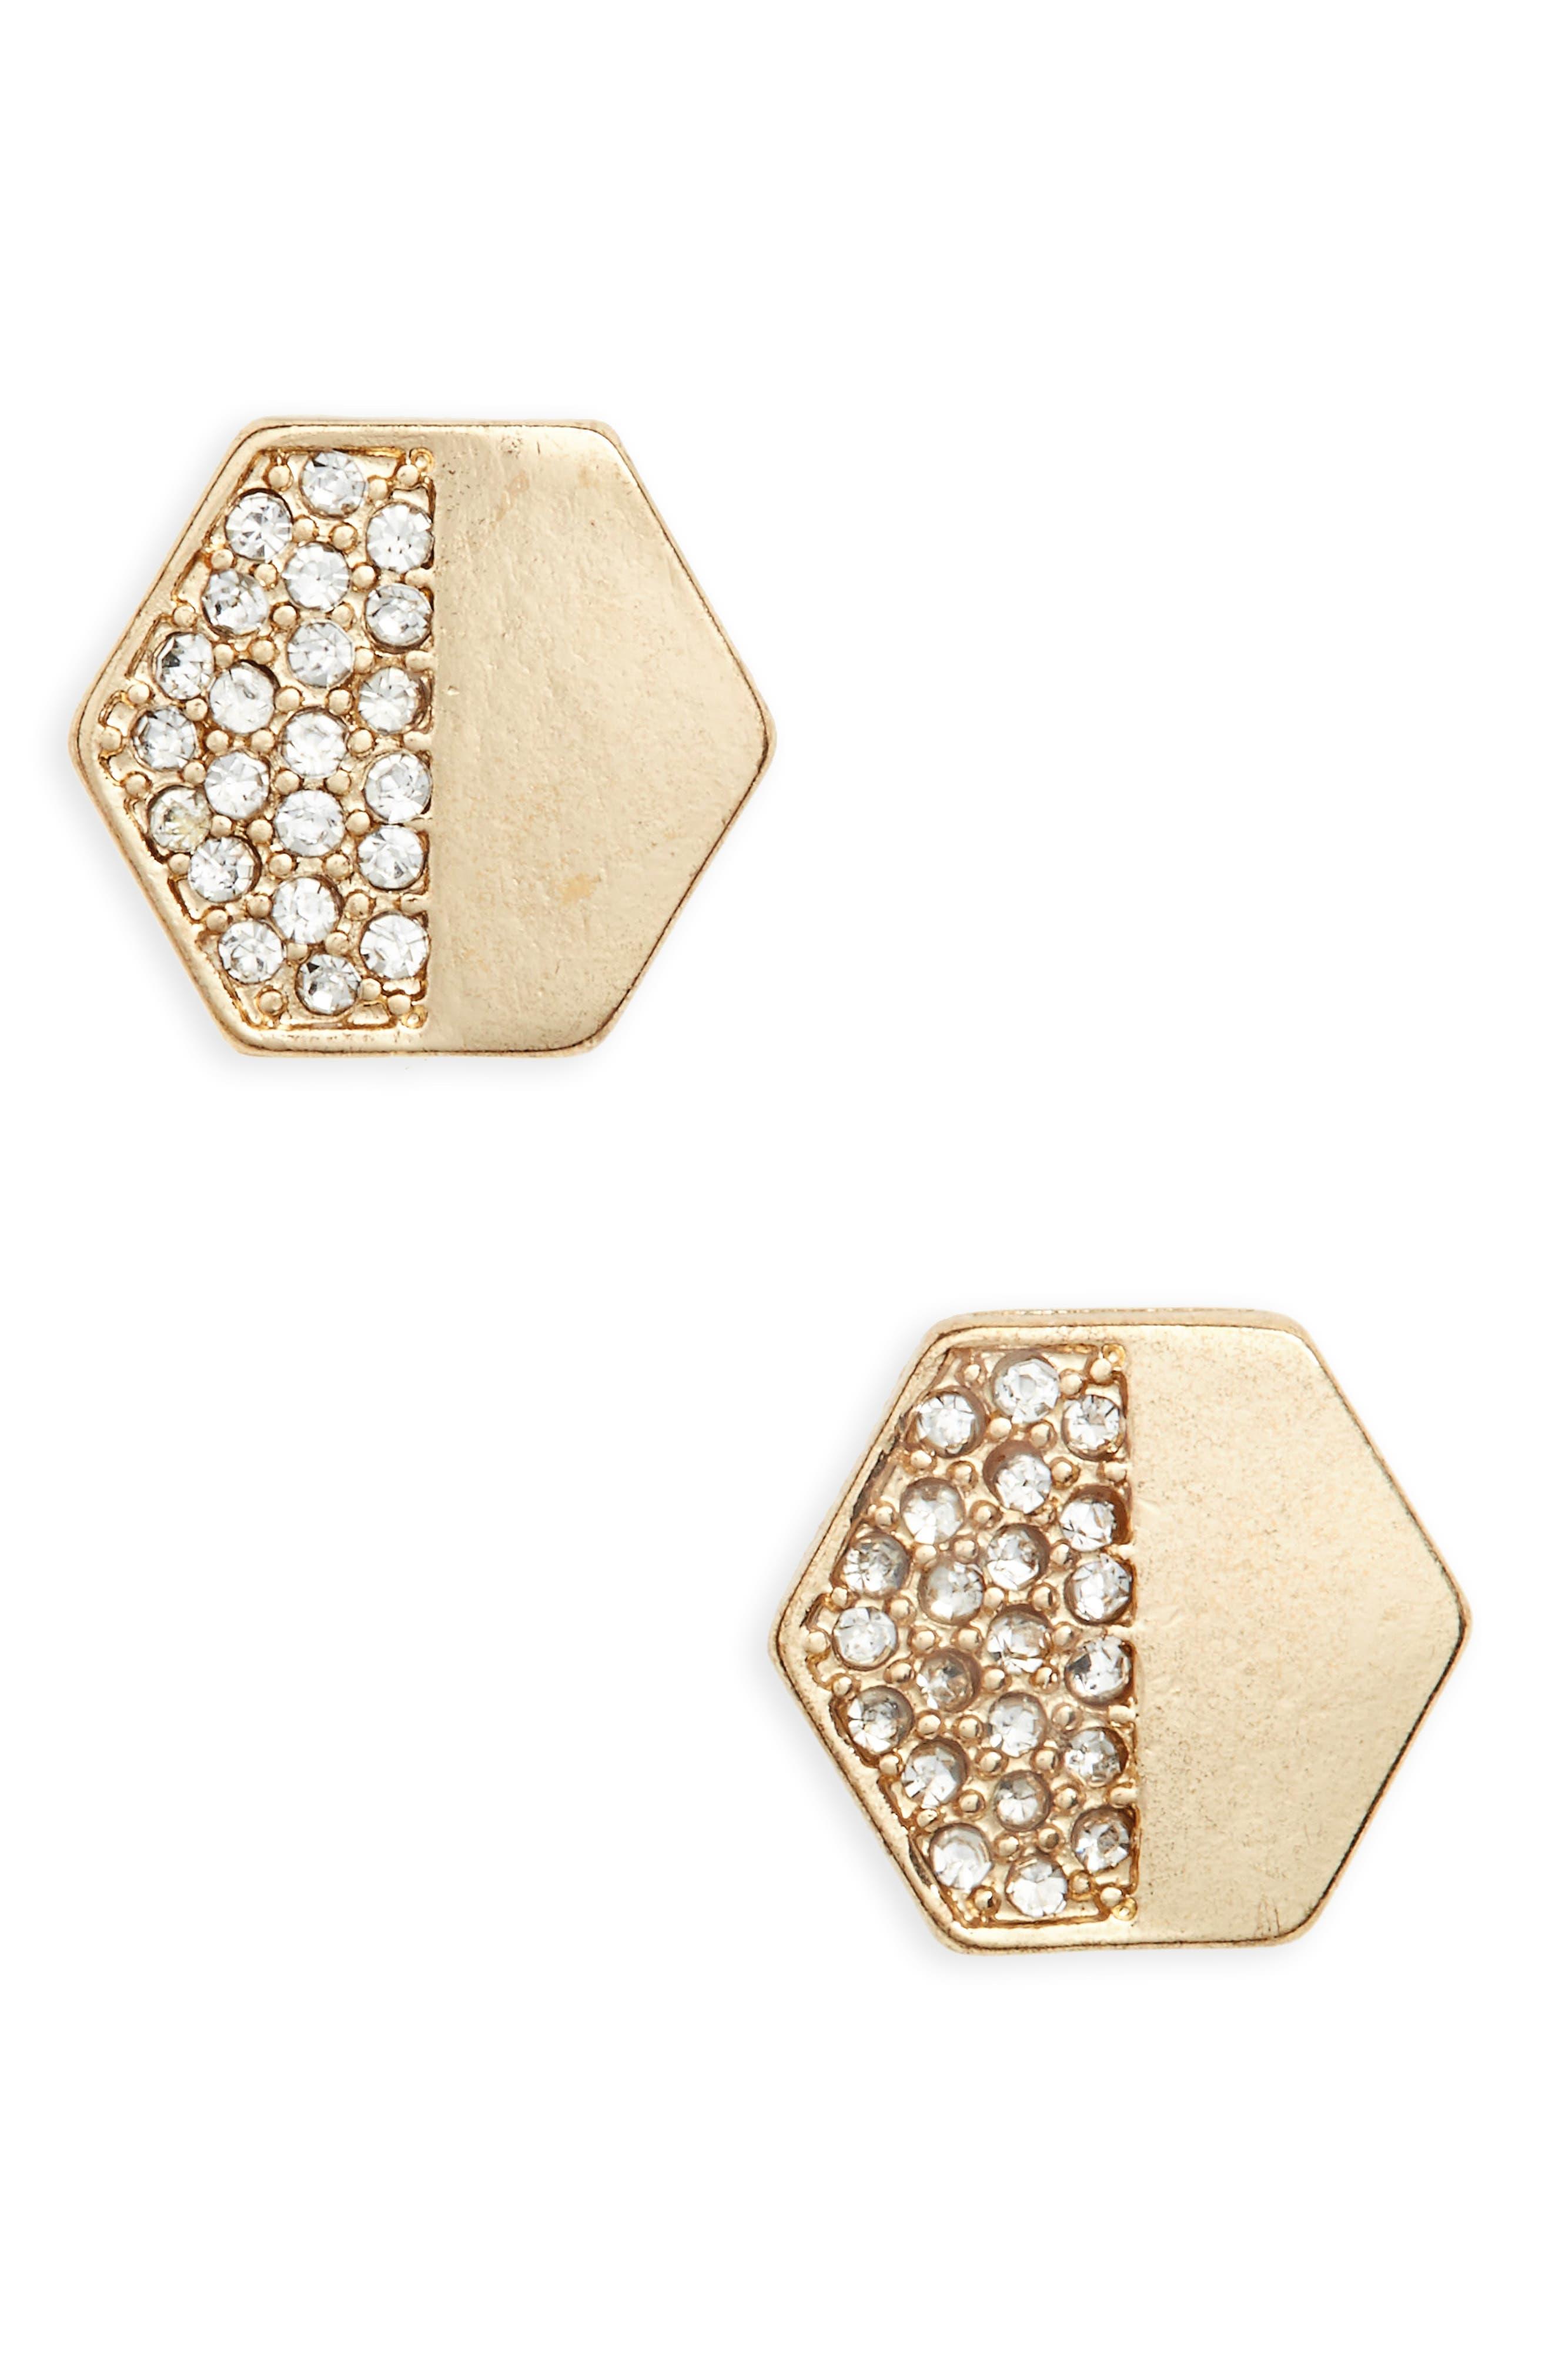 Crystal Hexagon Stud Earrings,                             Main thumbnail 1, color,                             710